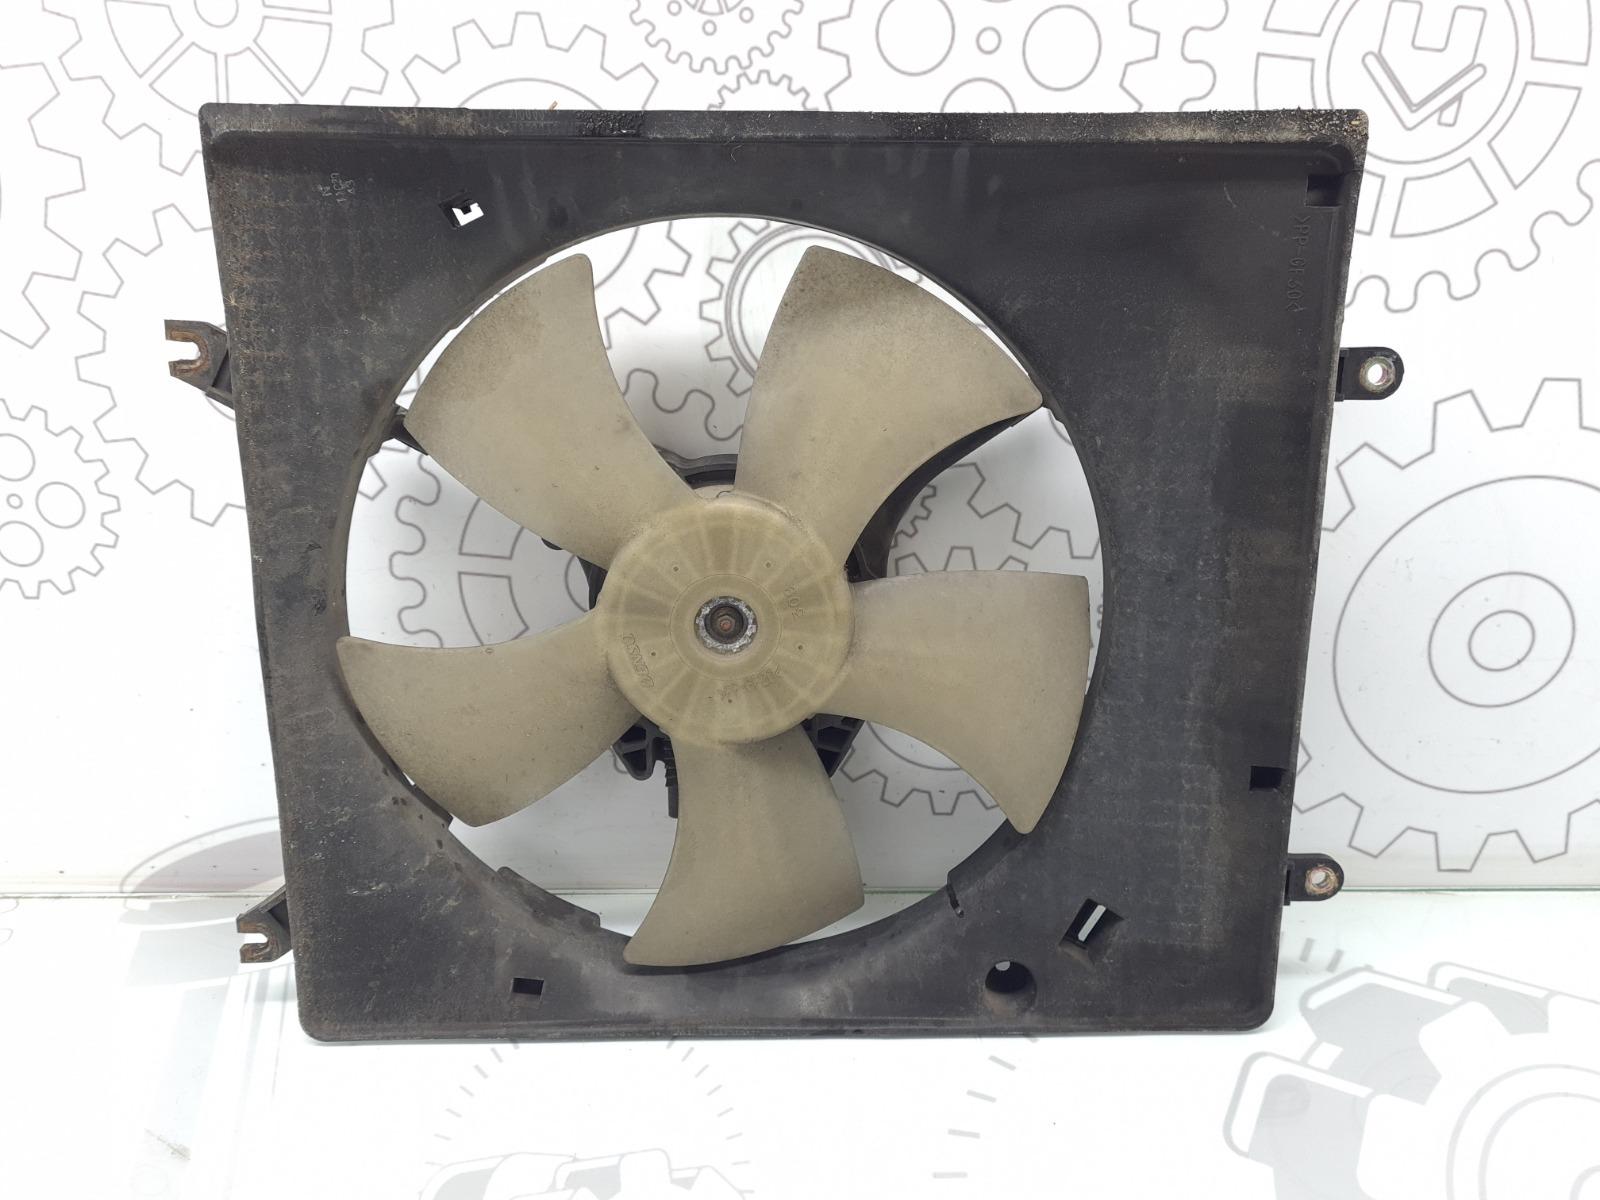 Вентилятор радиатора Mitsubishi Space Wagon 3 2.4 I 2002 (б/у)